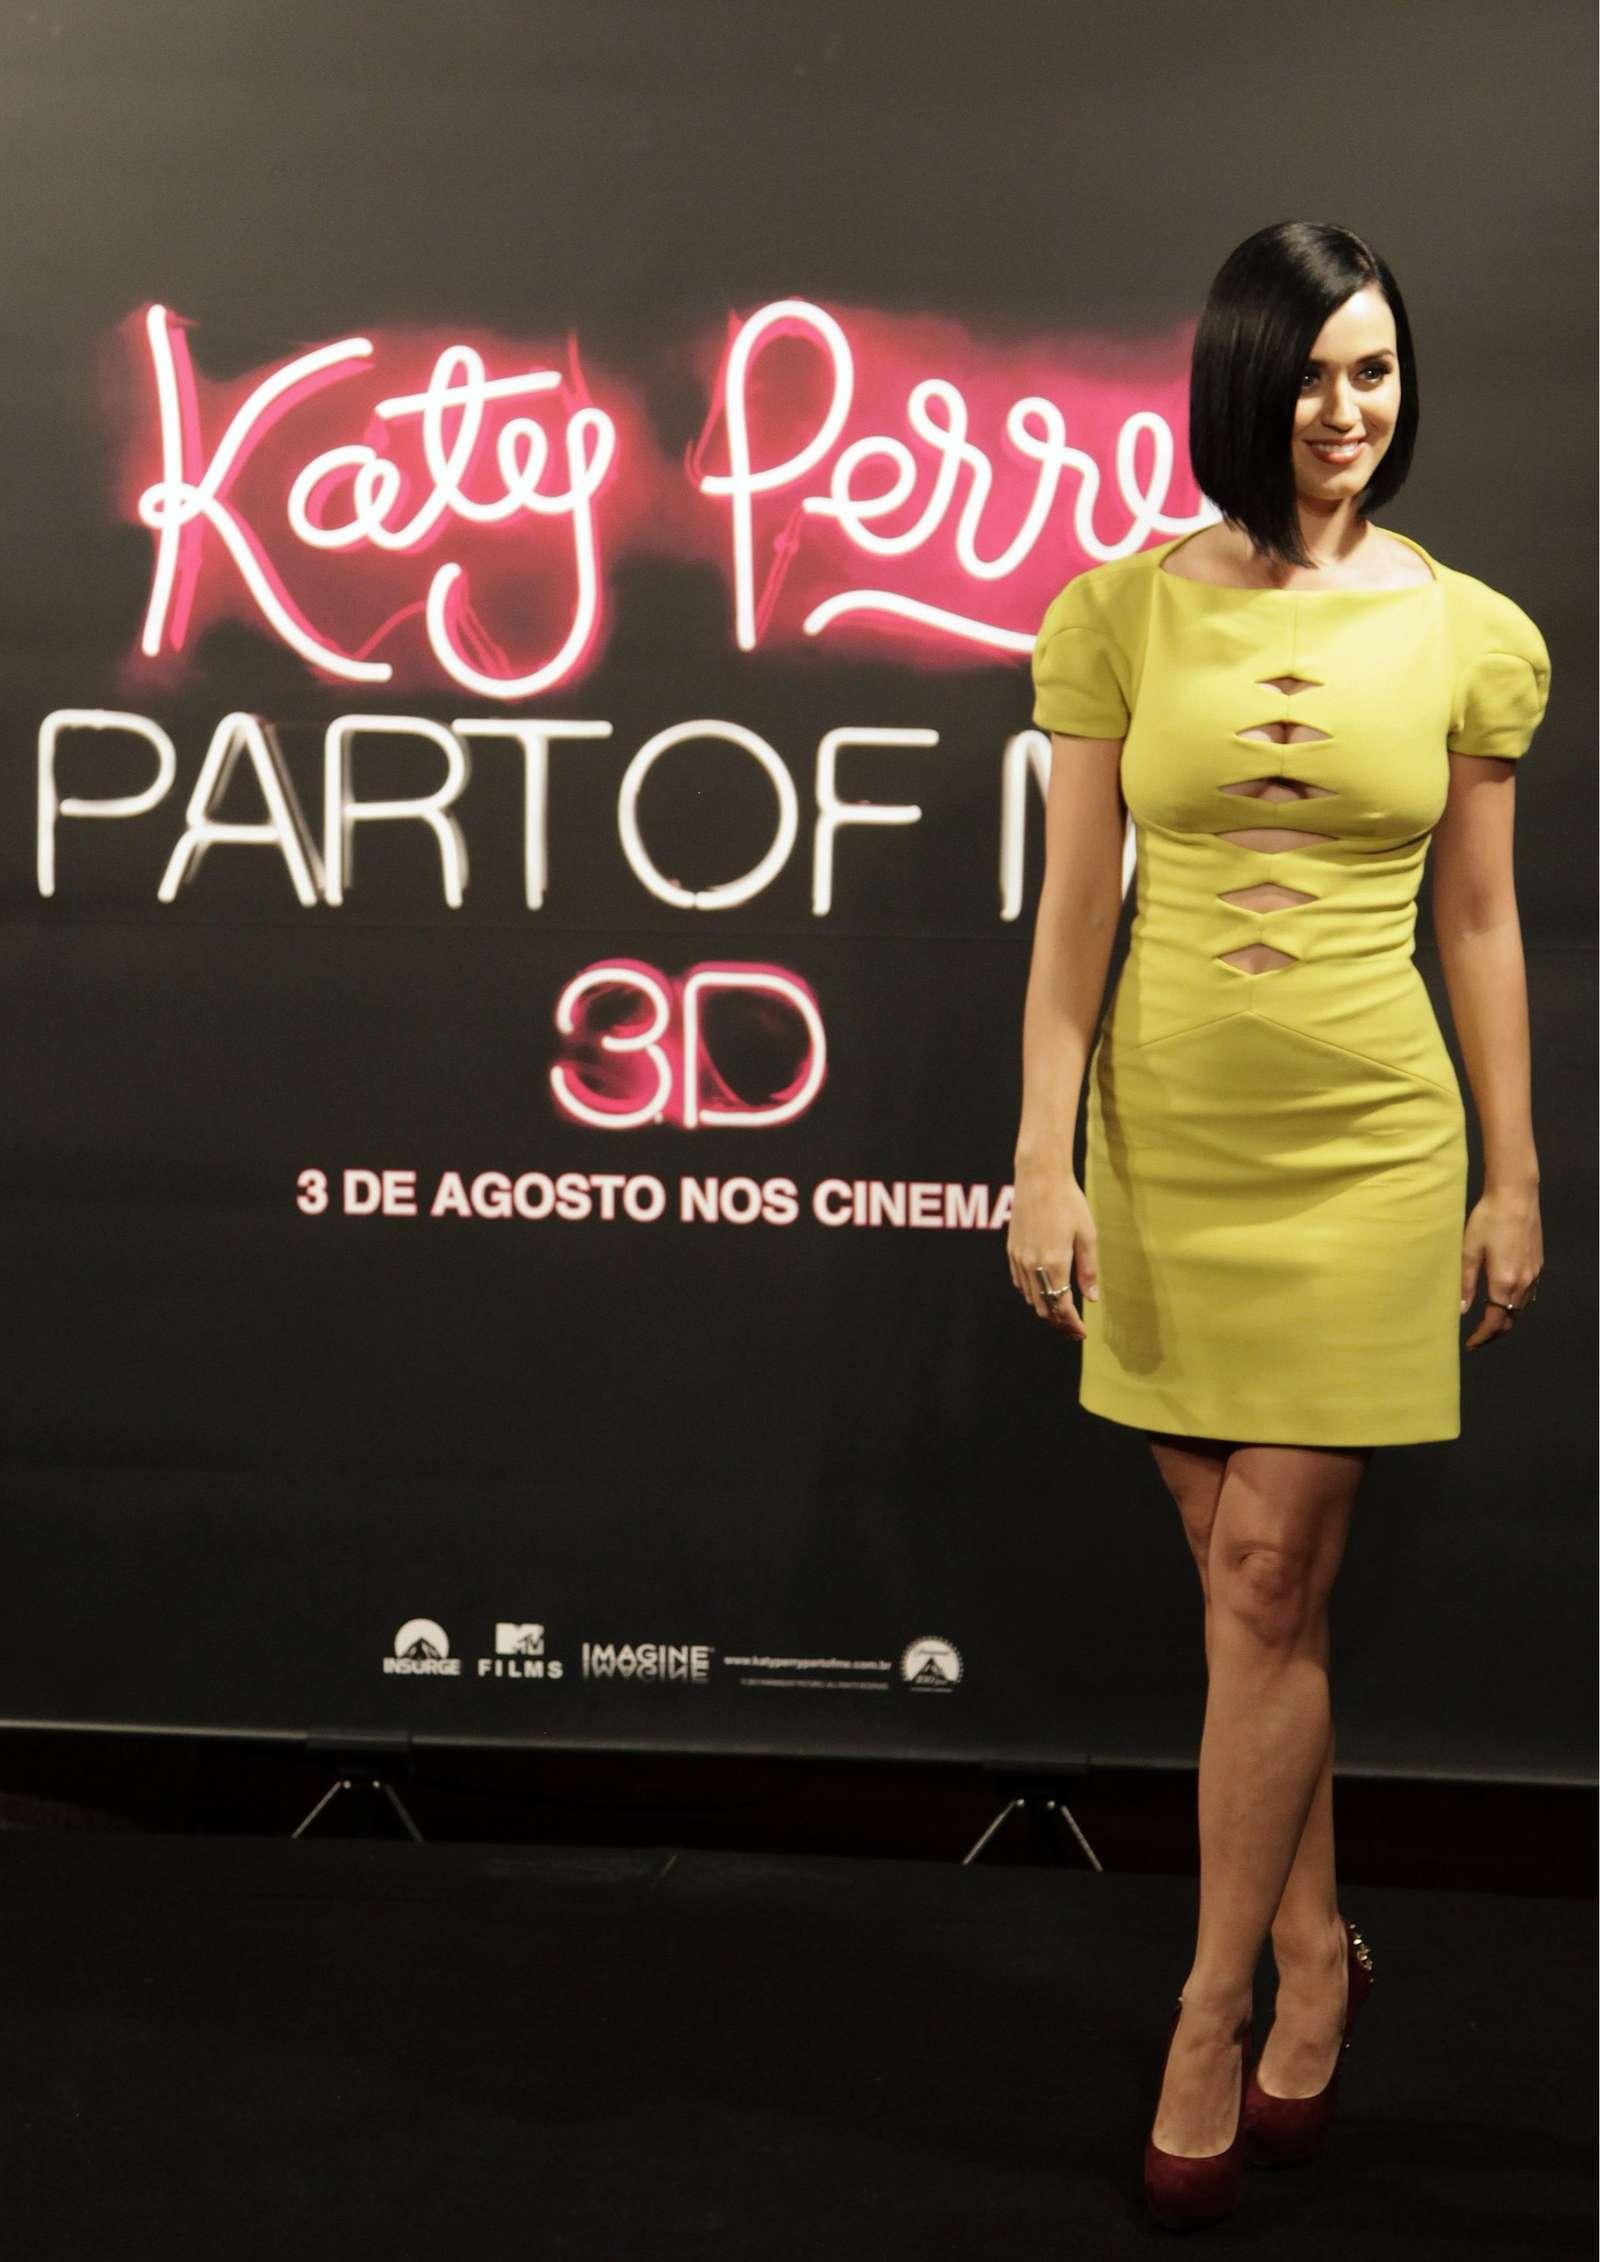 Katy Perry 2012 : katy-perry-photocall-part-of-me-in-rio-de-janeiro-17